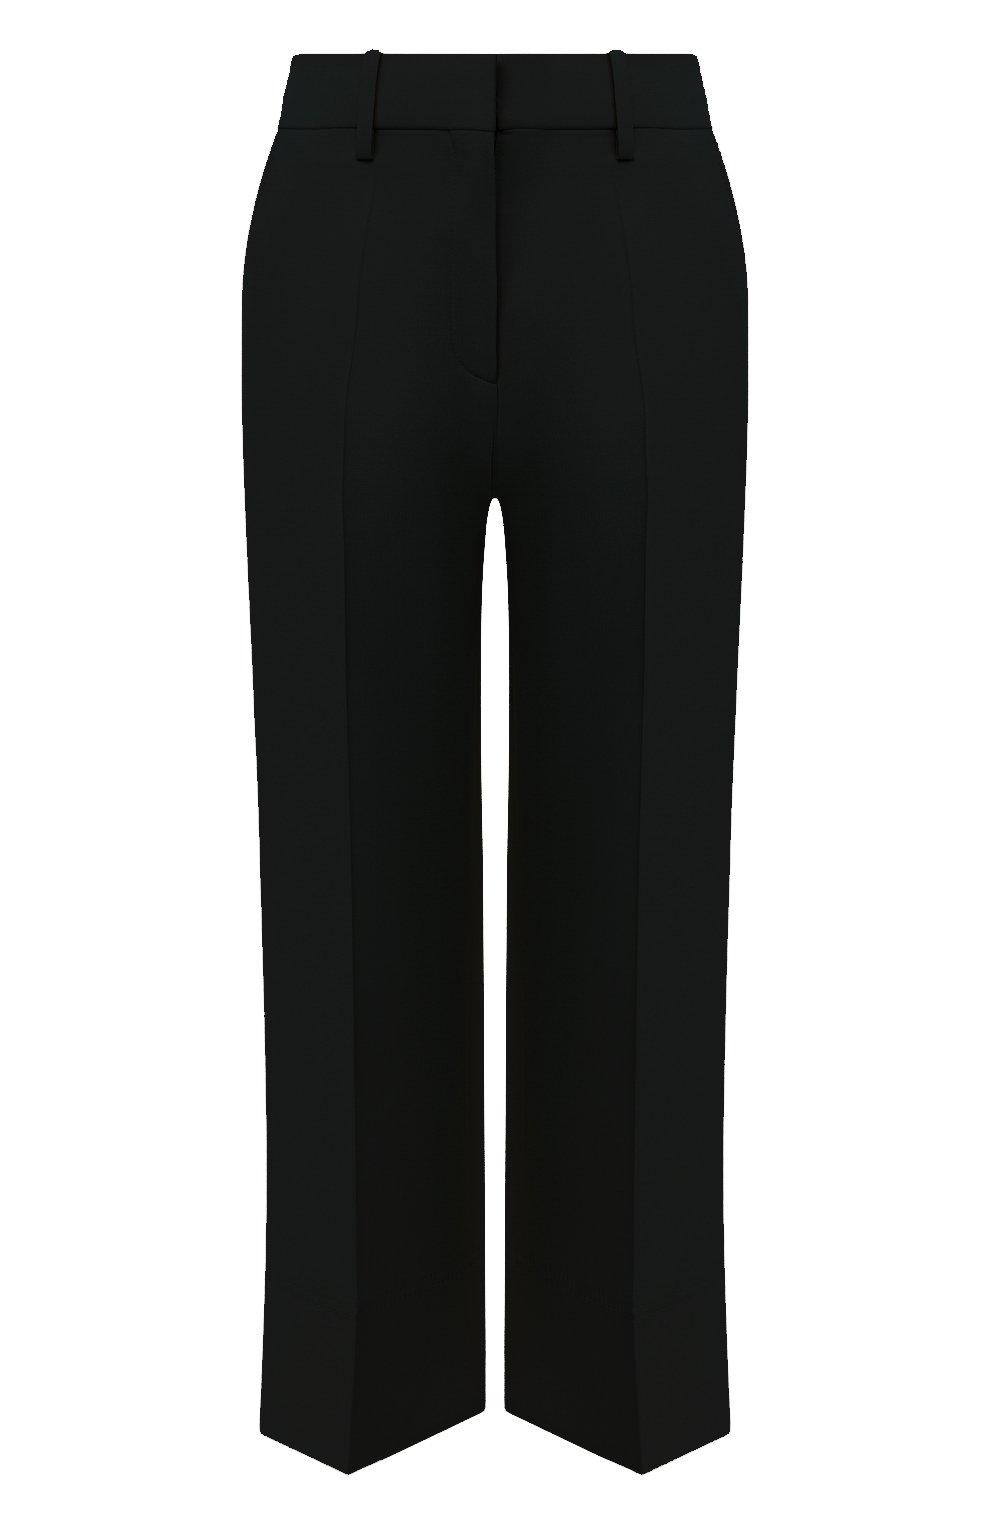 Женские брюки из шерсти и шелка VALENTINO черного цвета, арт. UB3RB3X01CF | Фото 1